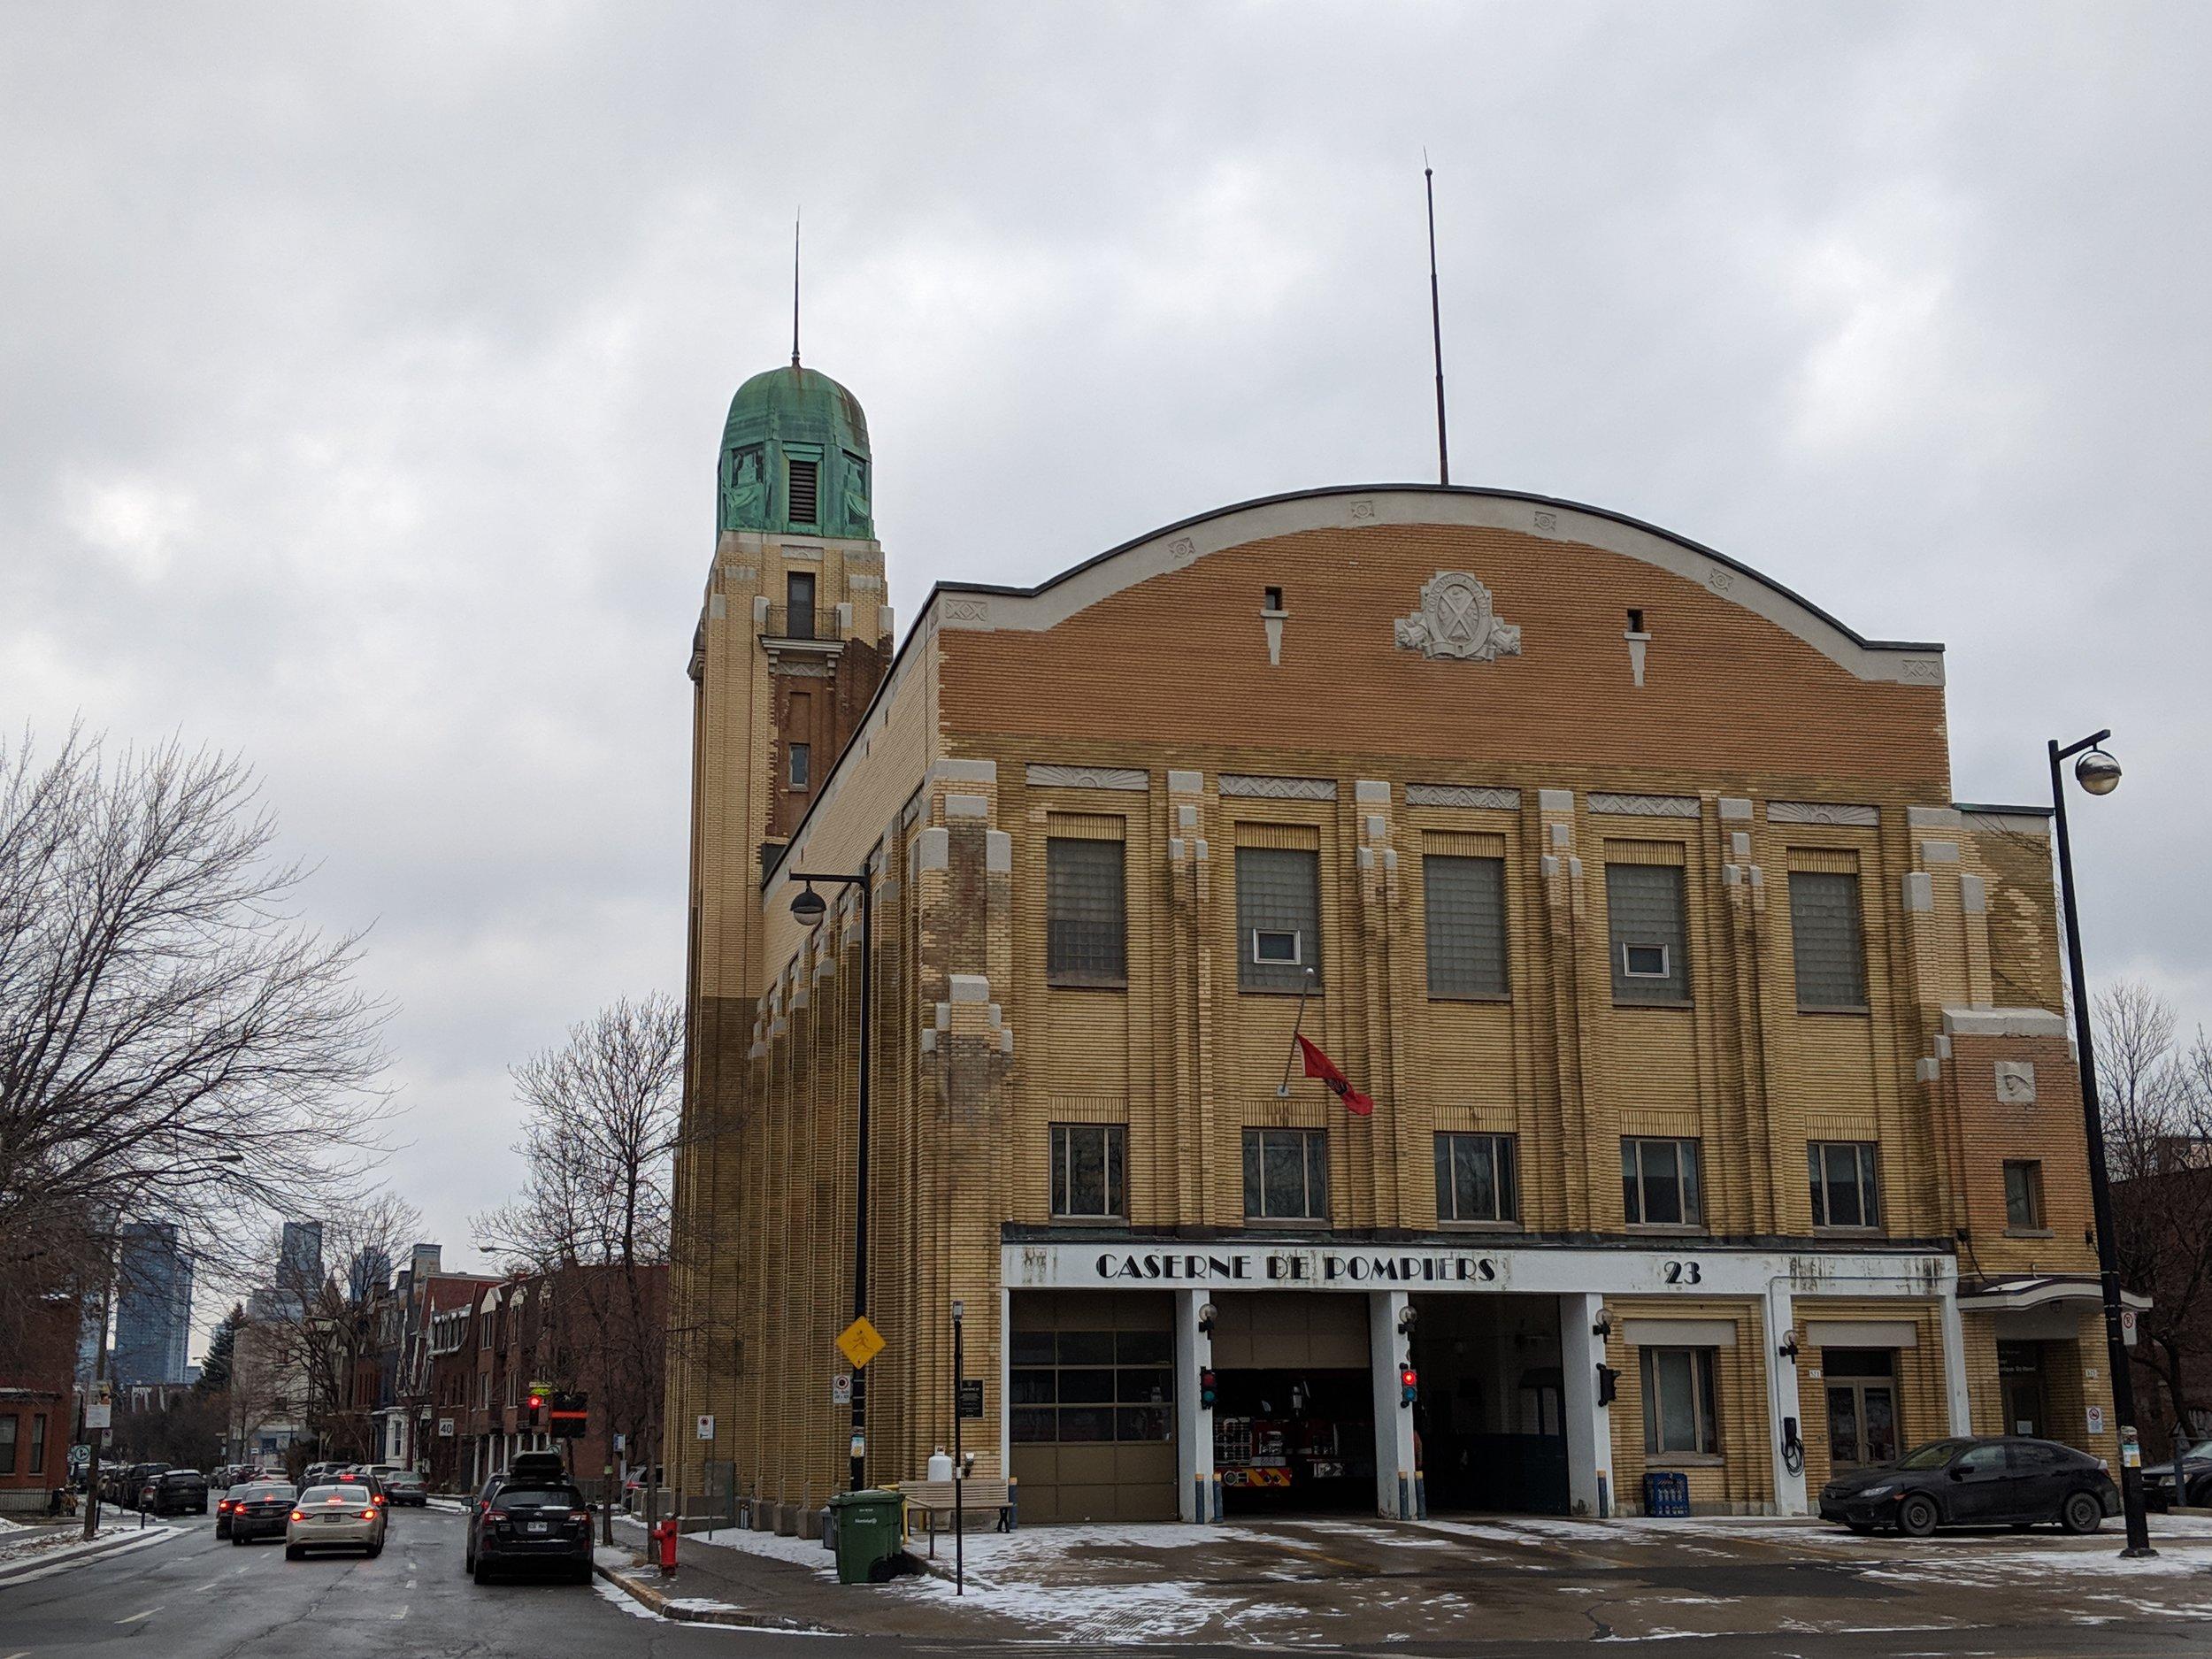 Caserne de Pompiers No.23 . Saint-Henri, a Montreal neighbourhood guide